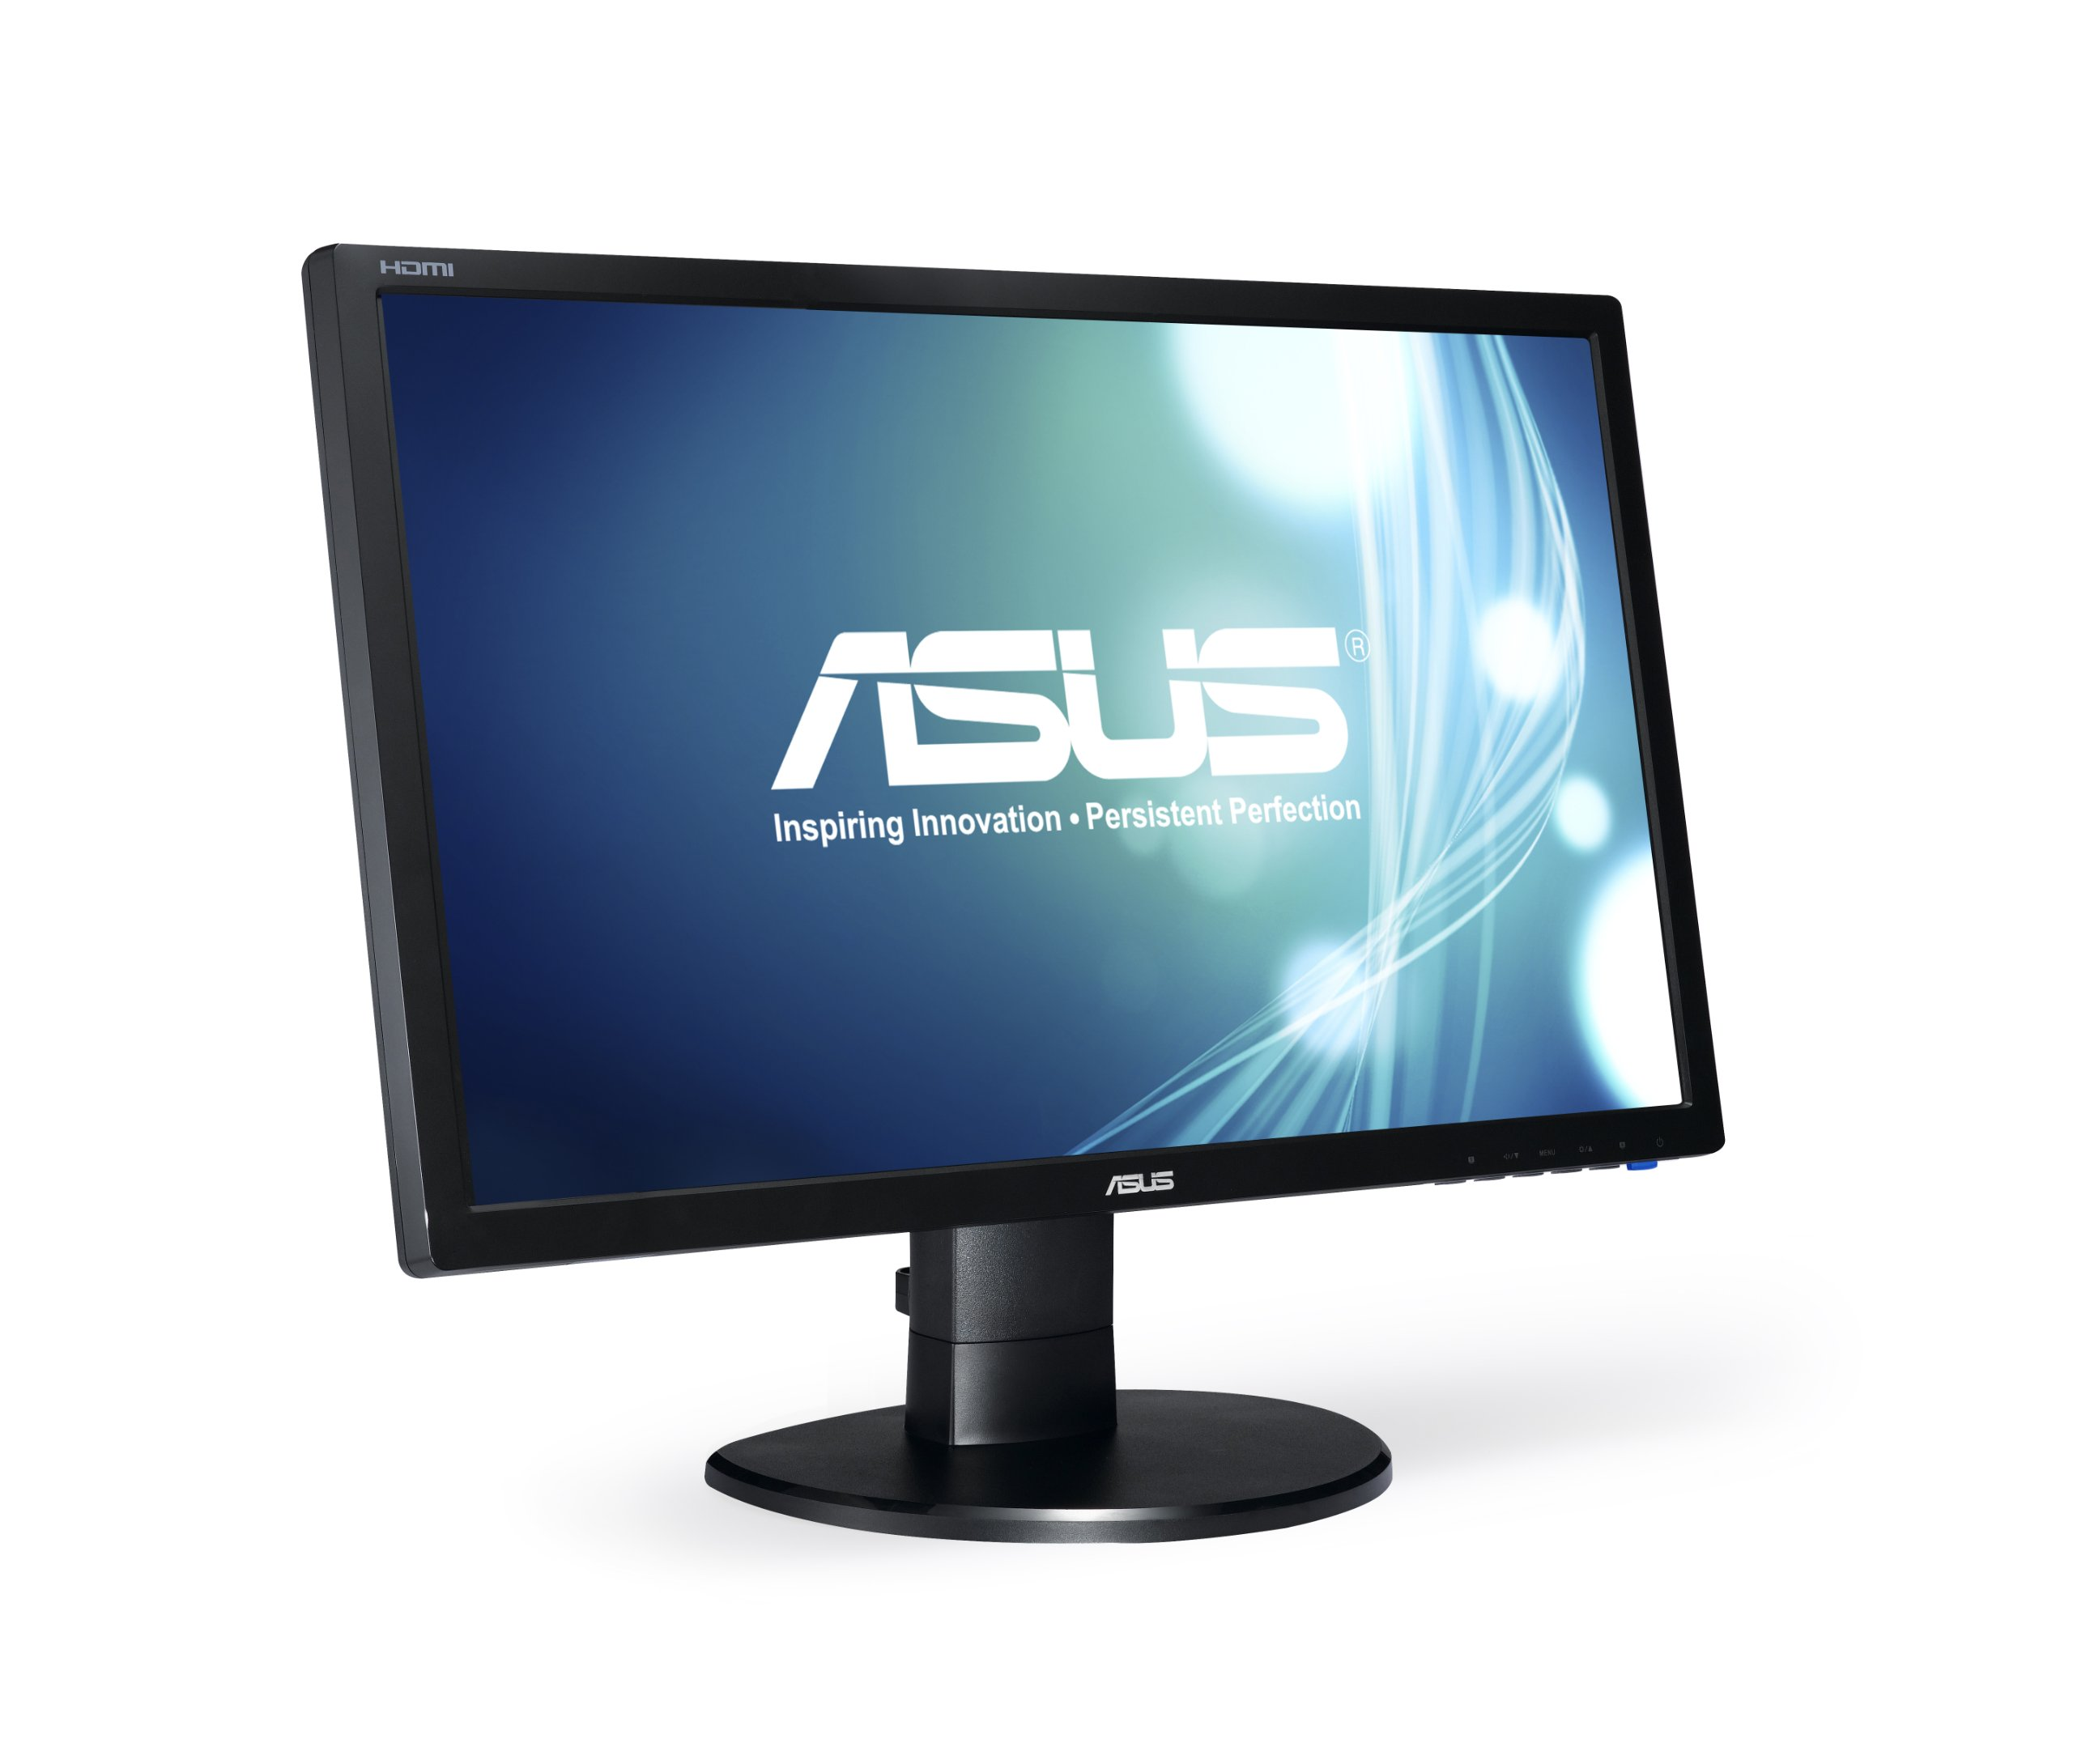 "ASUS Celeron Chromebox and 24"" Full HD Monitor with ChromeOS keyboard-mouse Bundle Kit 2"